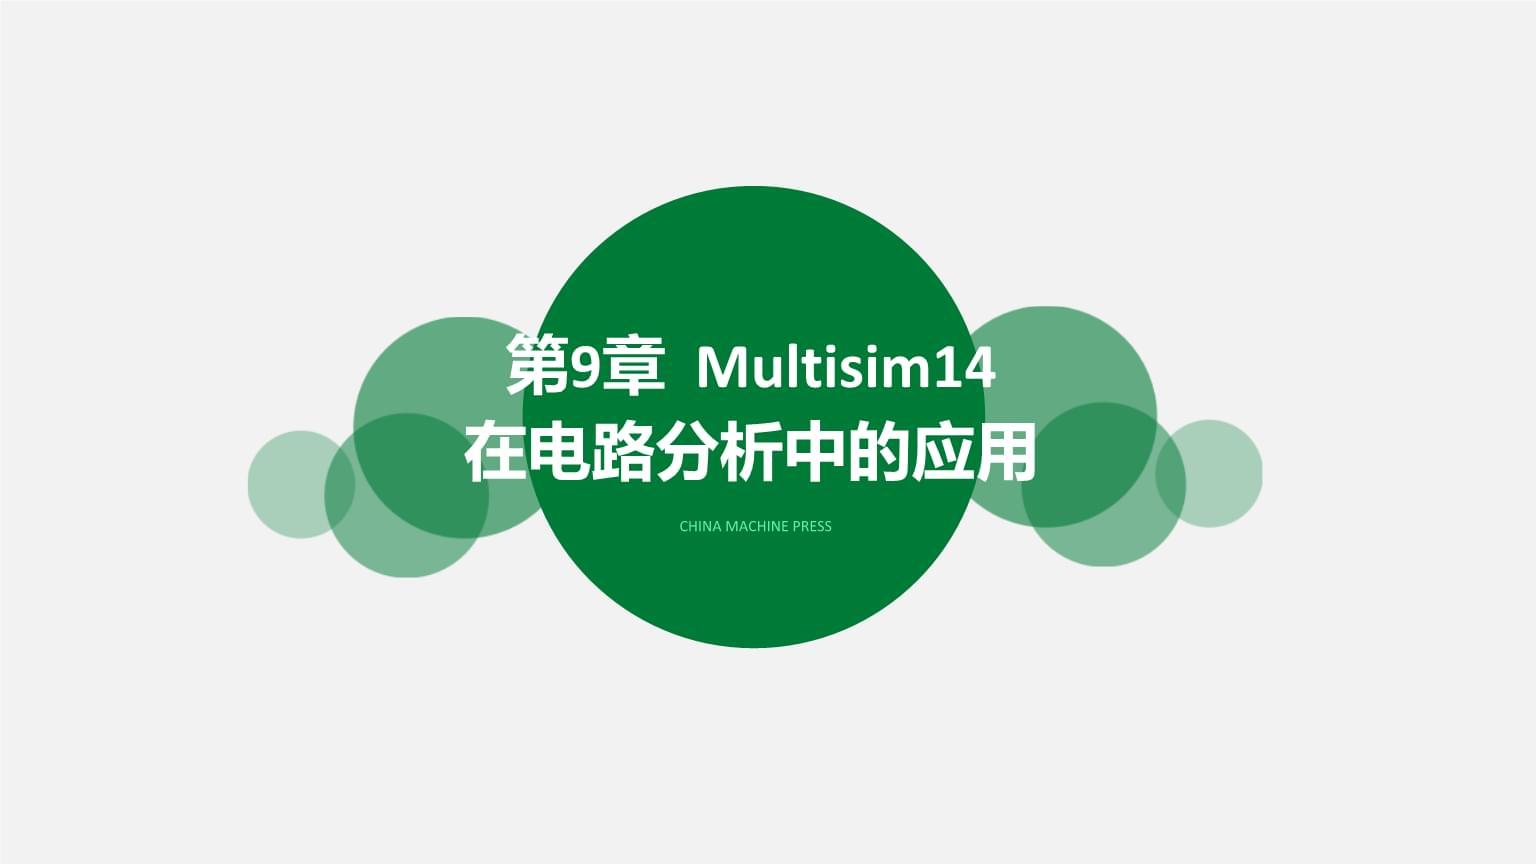 Multisim14电子系统仿真与设计第9章 Multisim14在电路分析中的应用.ppt